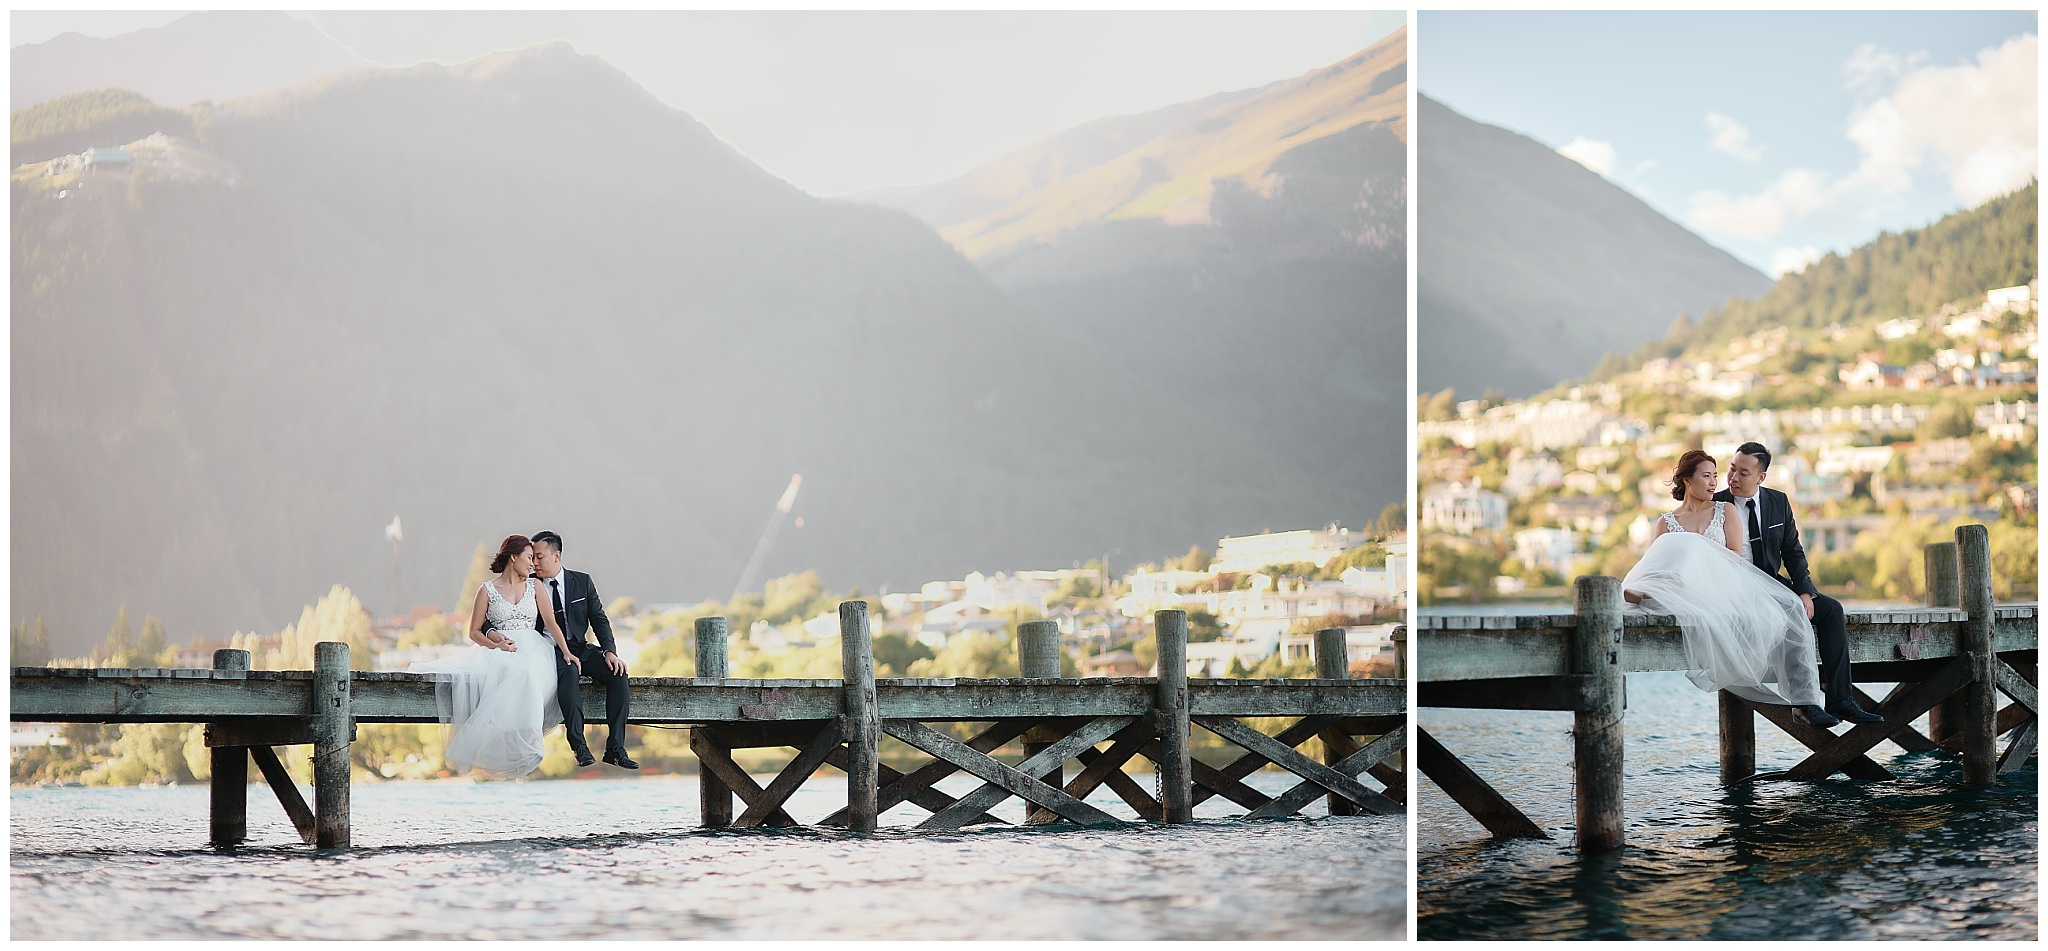 Queenstown New Zealand Prewedding Photographer_0037.jpg